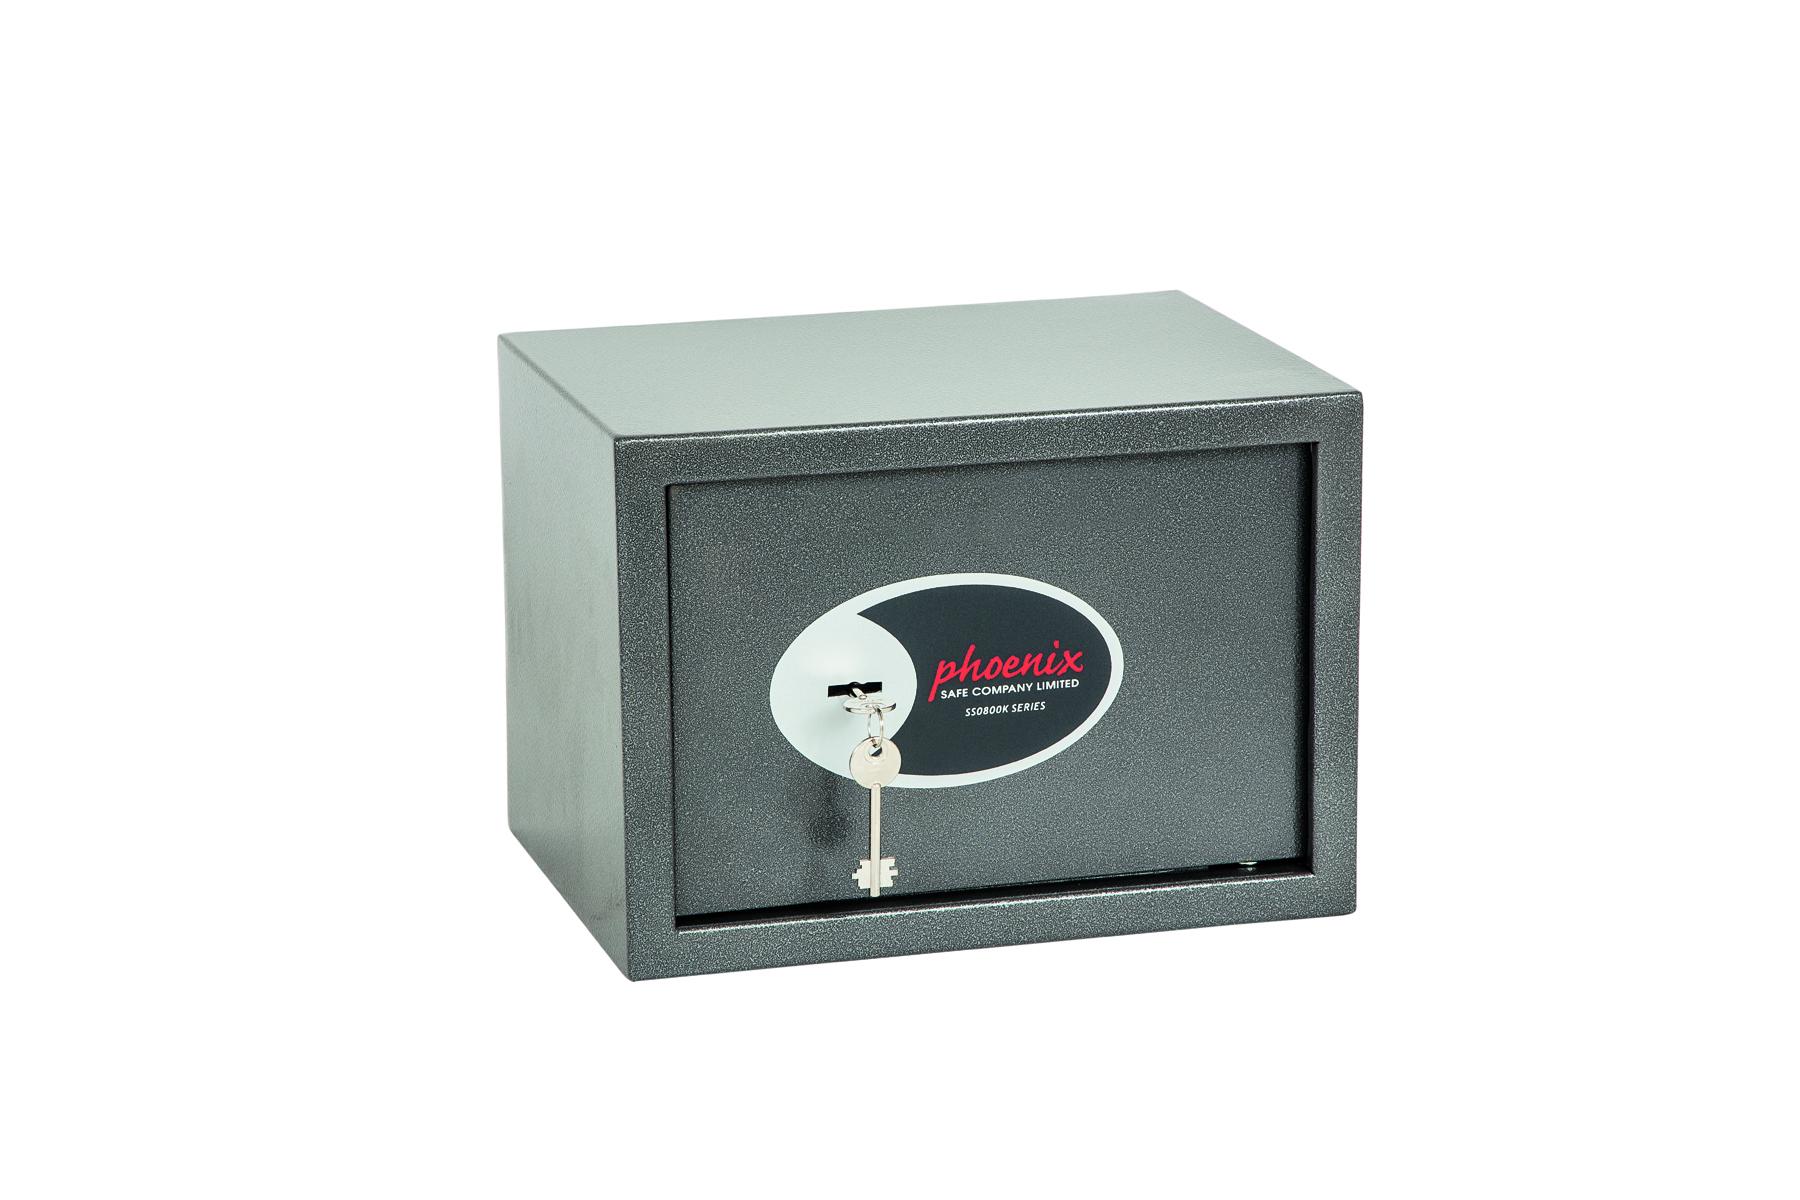 Phoenix Vela Home and Office Size 2 Security Safe Key Lock Graphite Grey SS0802K